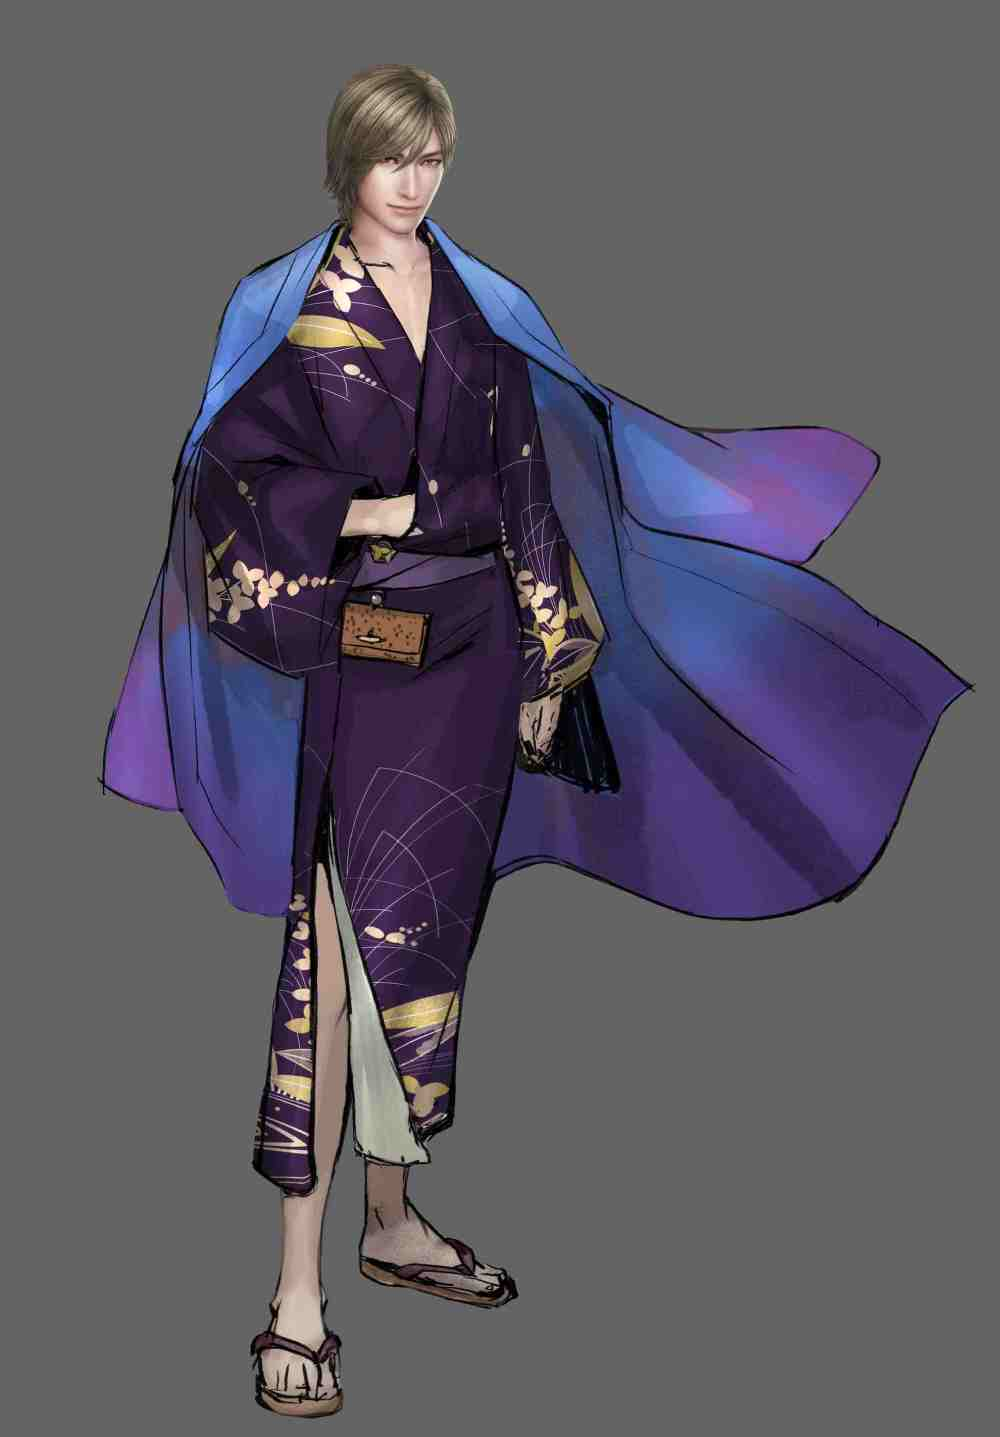 Warriors Orochi 4 Guo Jia Alternate Costume